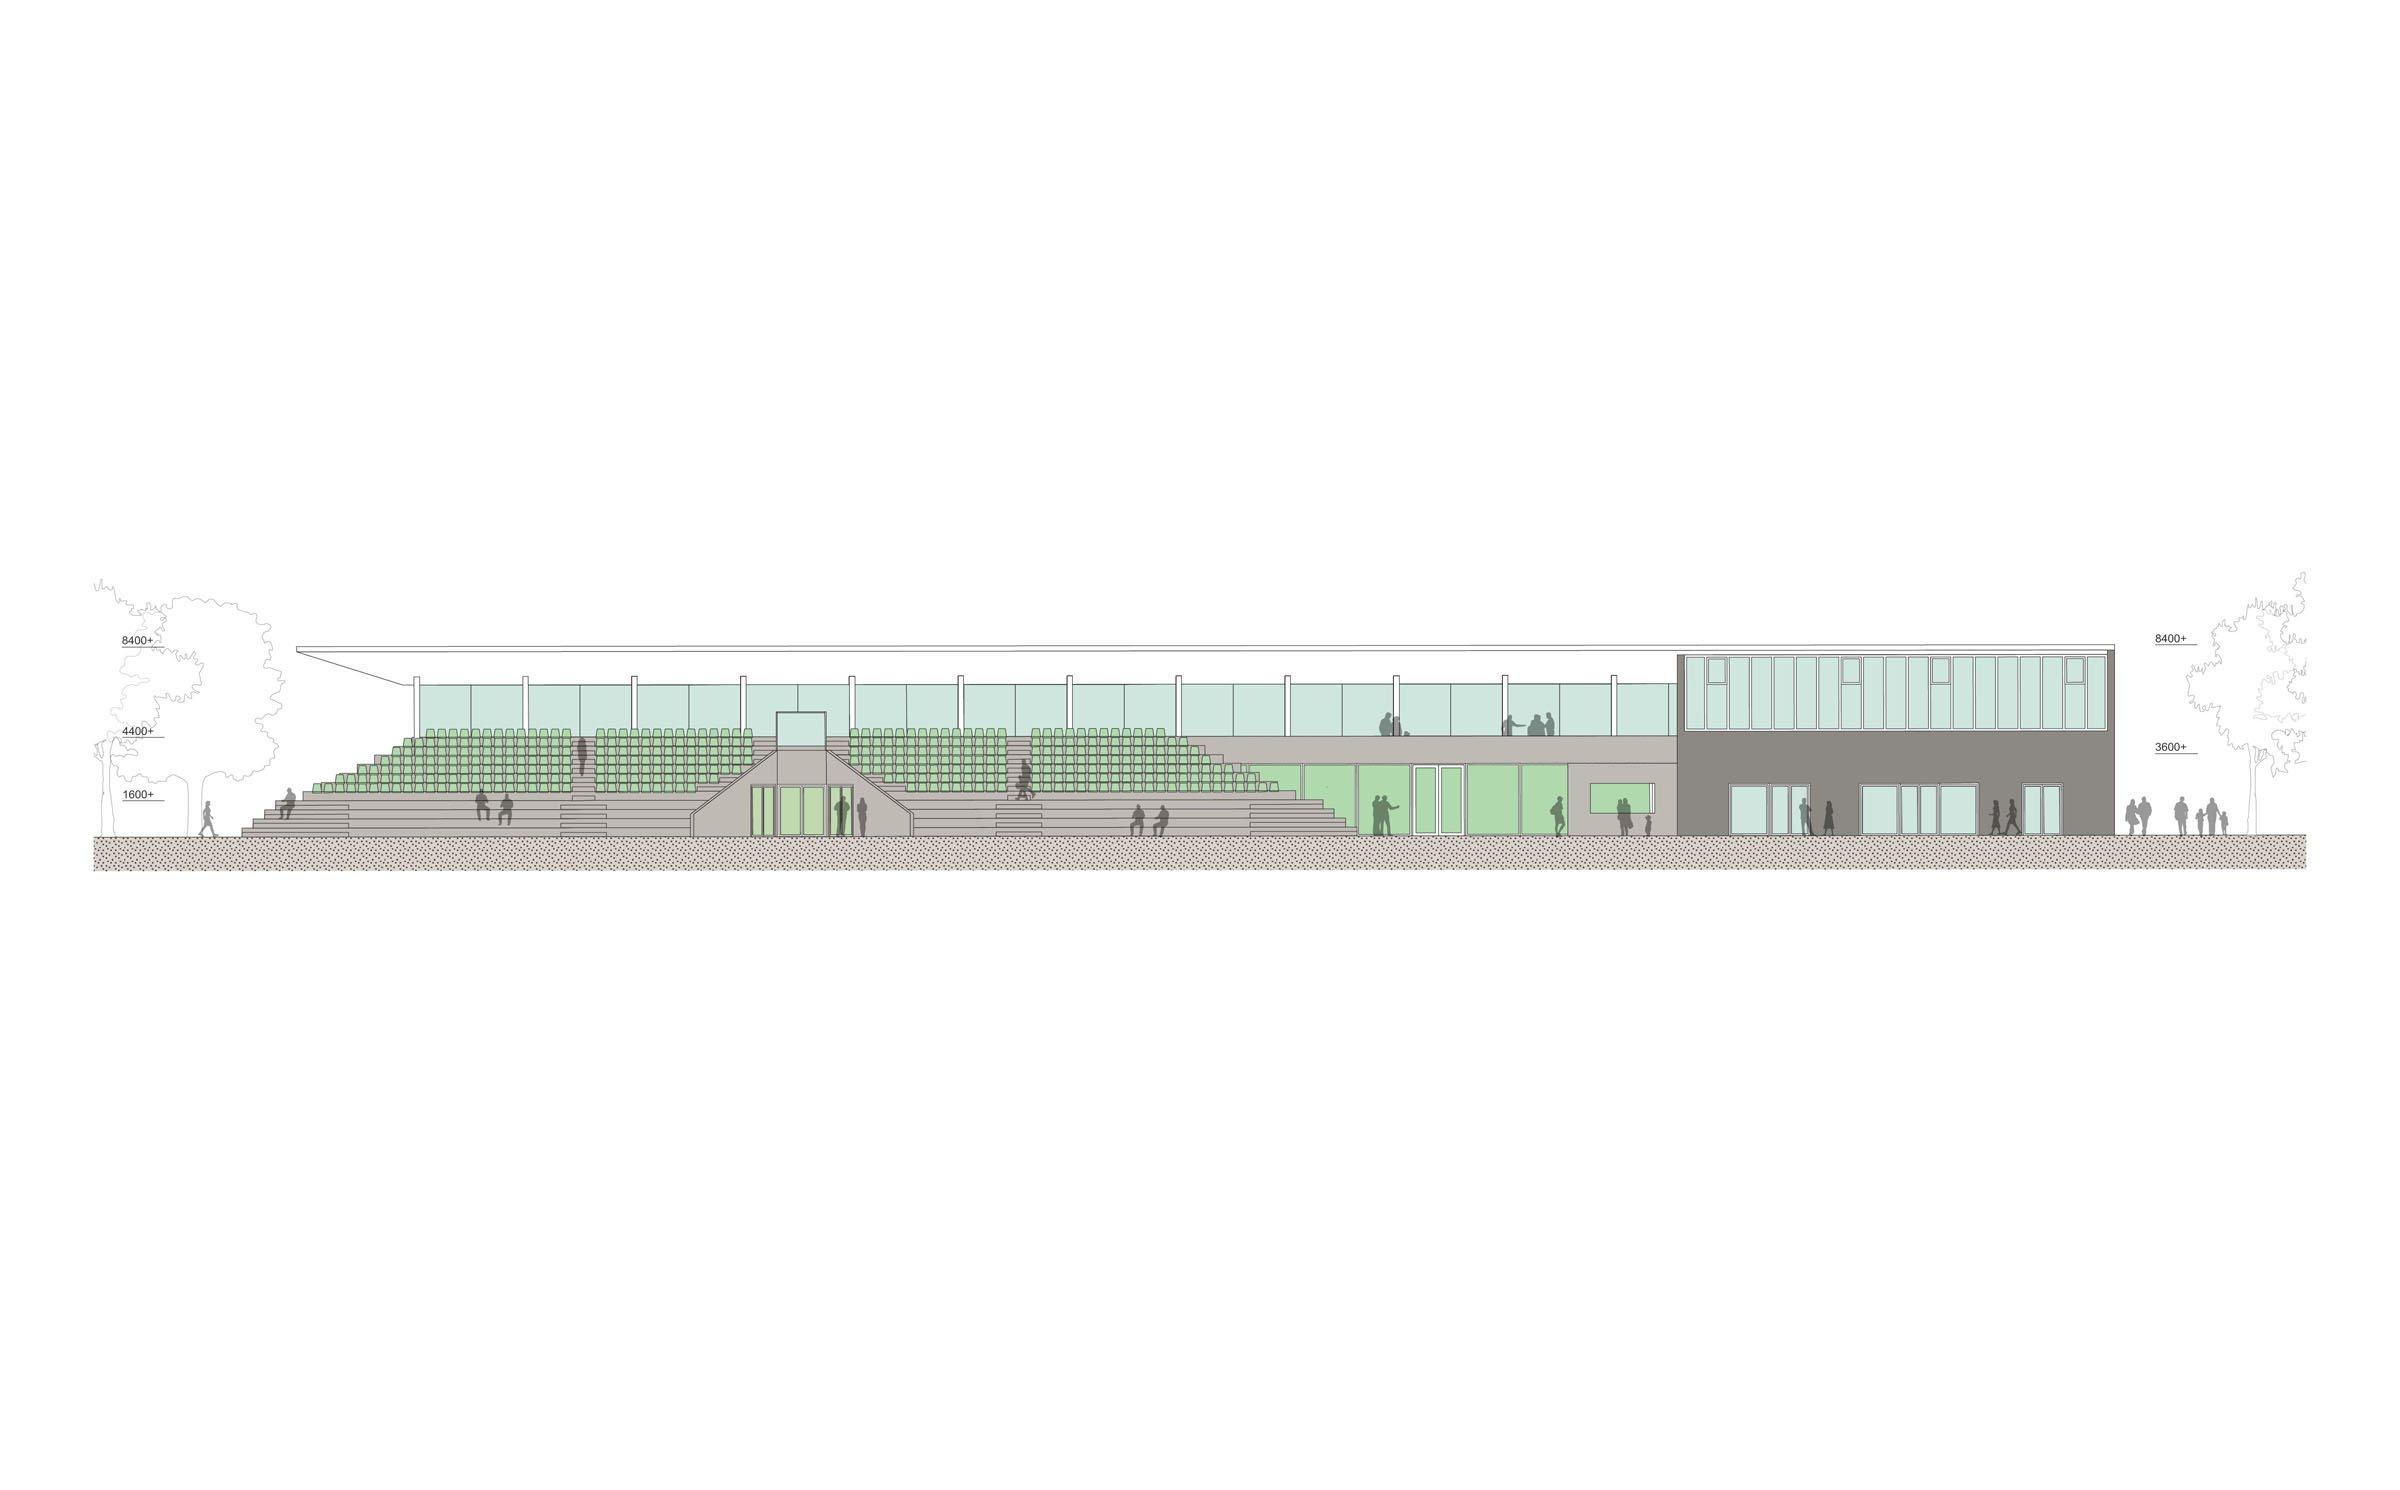 studio-komma-sportaccommodatie-tribune-clubhuis-architectuur-berg-clubgebouwen-accommodatie